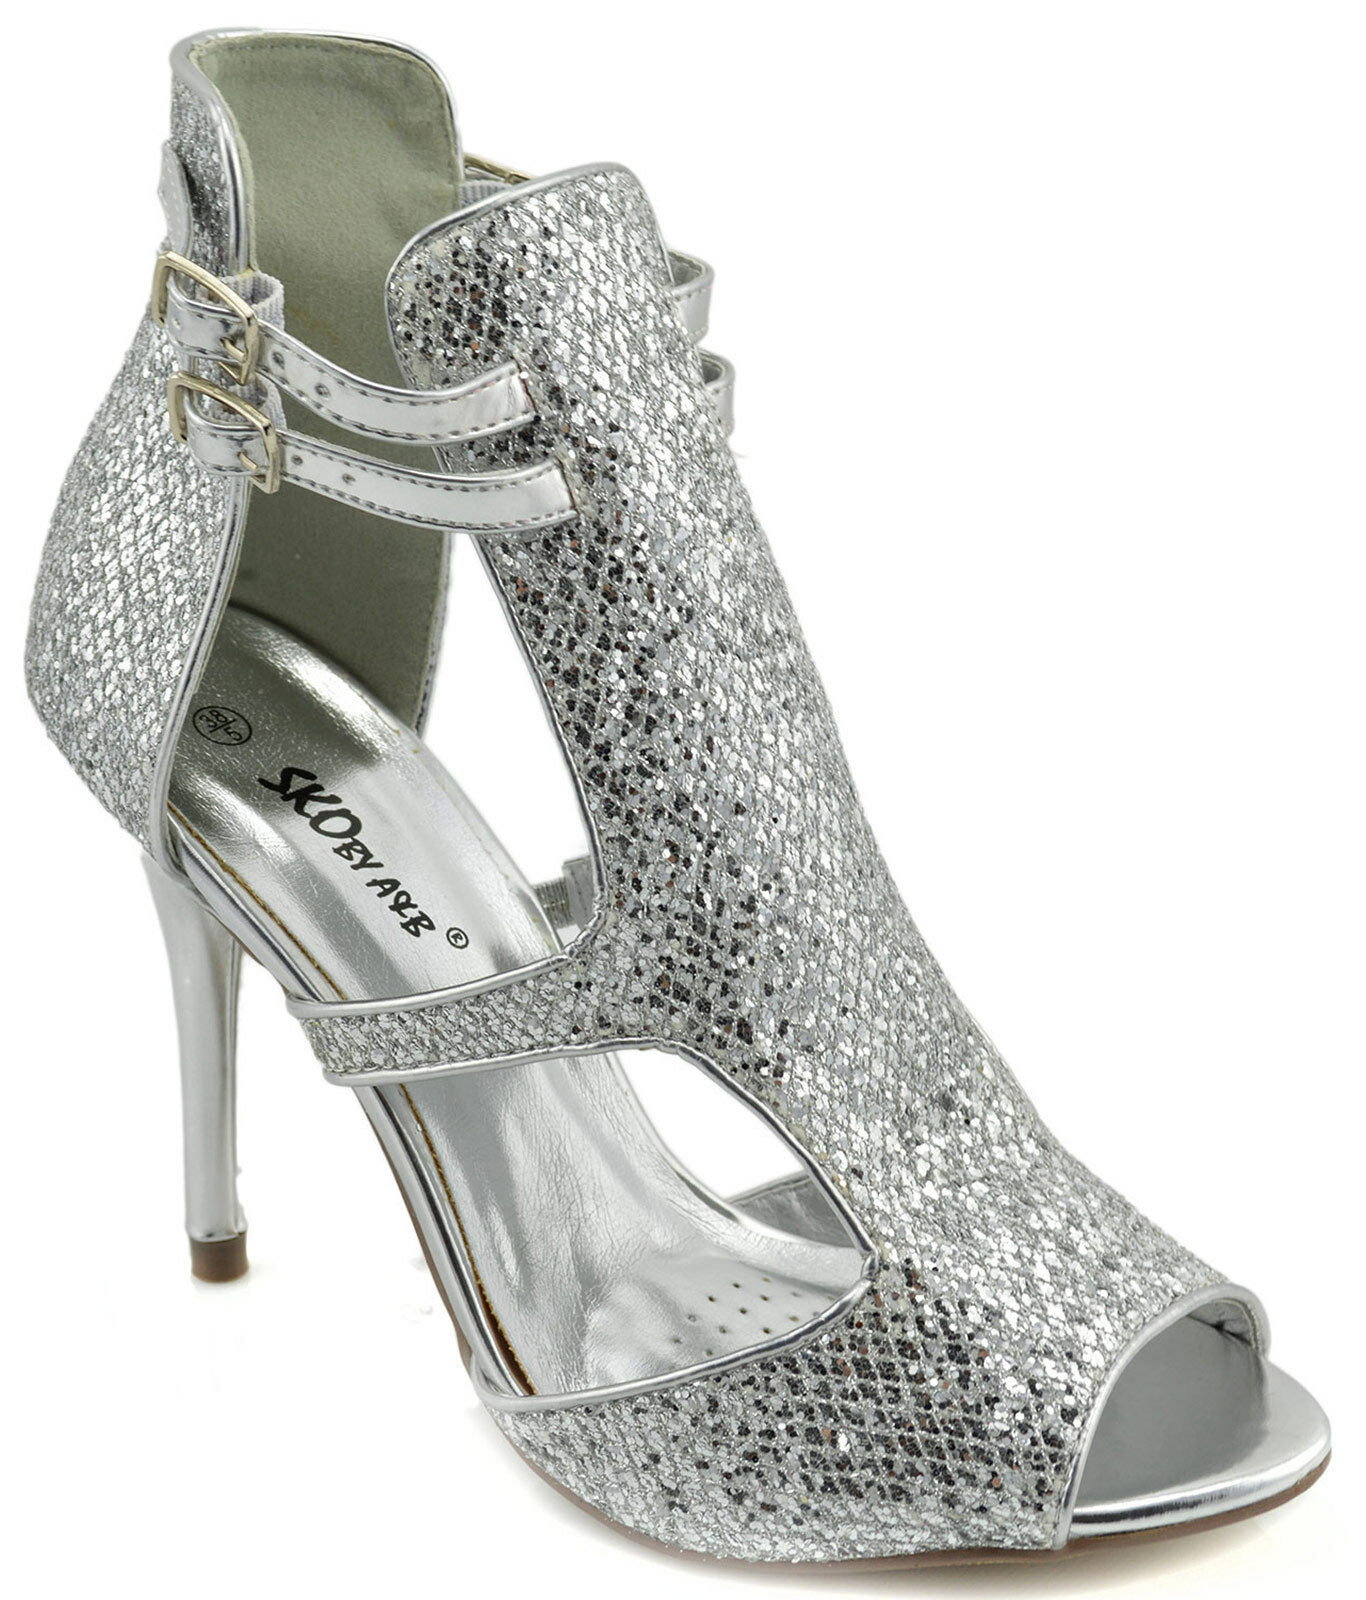 140 argent Sexy Stiletto Fashion Party femmes chaussures Sandals High Heels